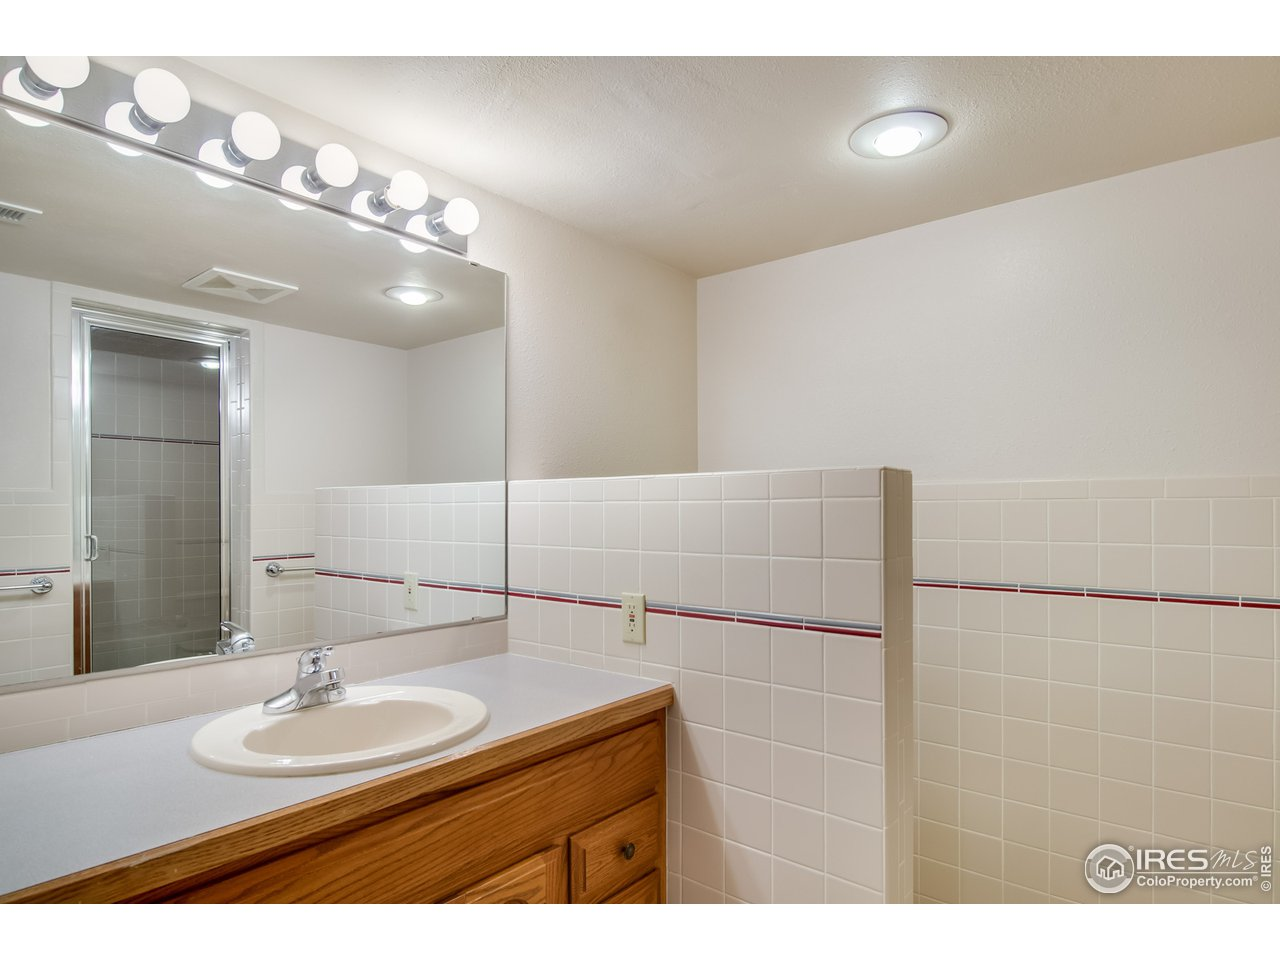 3/4 Basement Bathroom w/ Steam